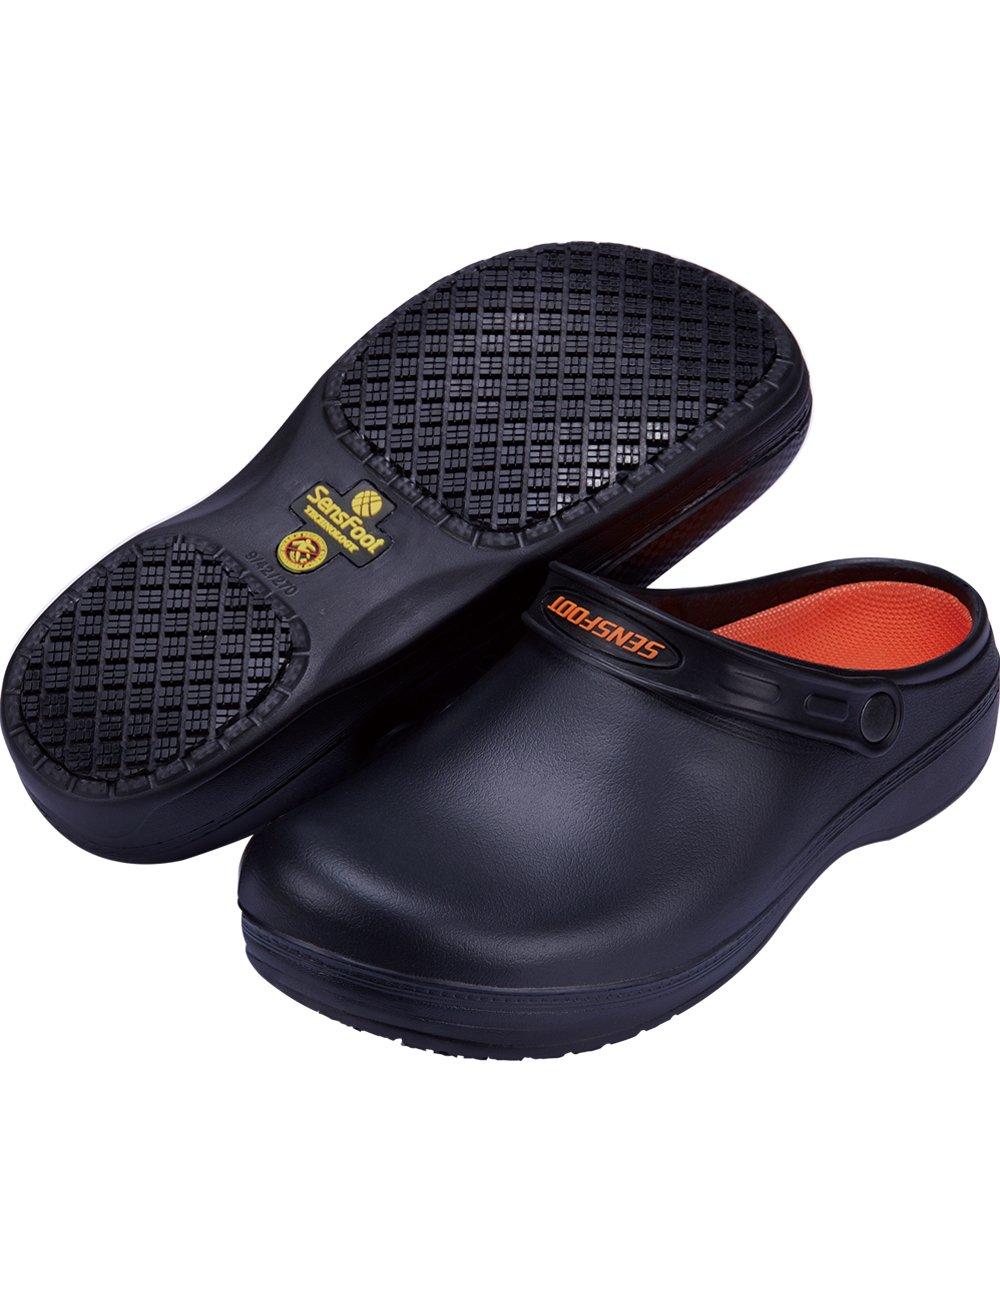 SensFoot Slip Resistant Chef Clogs for Kitchen Work Shoes for Men (11-11.5 US Men) Black by SensFoot